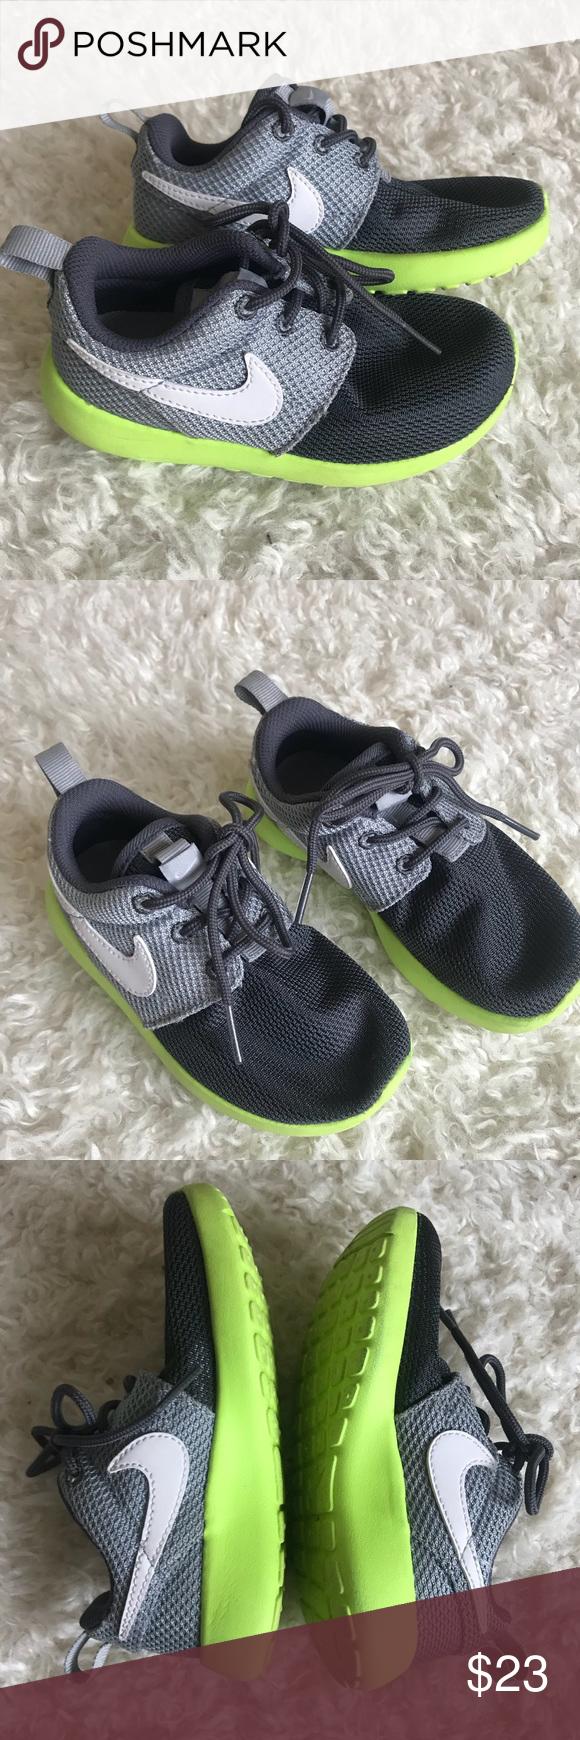 Toddler boy Nike shoes 9C | Nike shoes